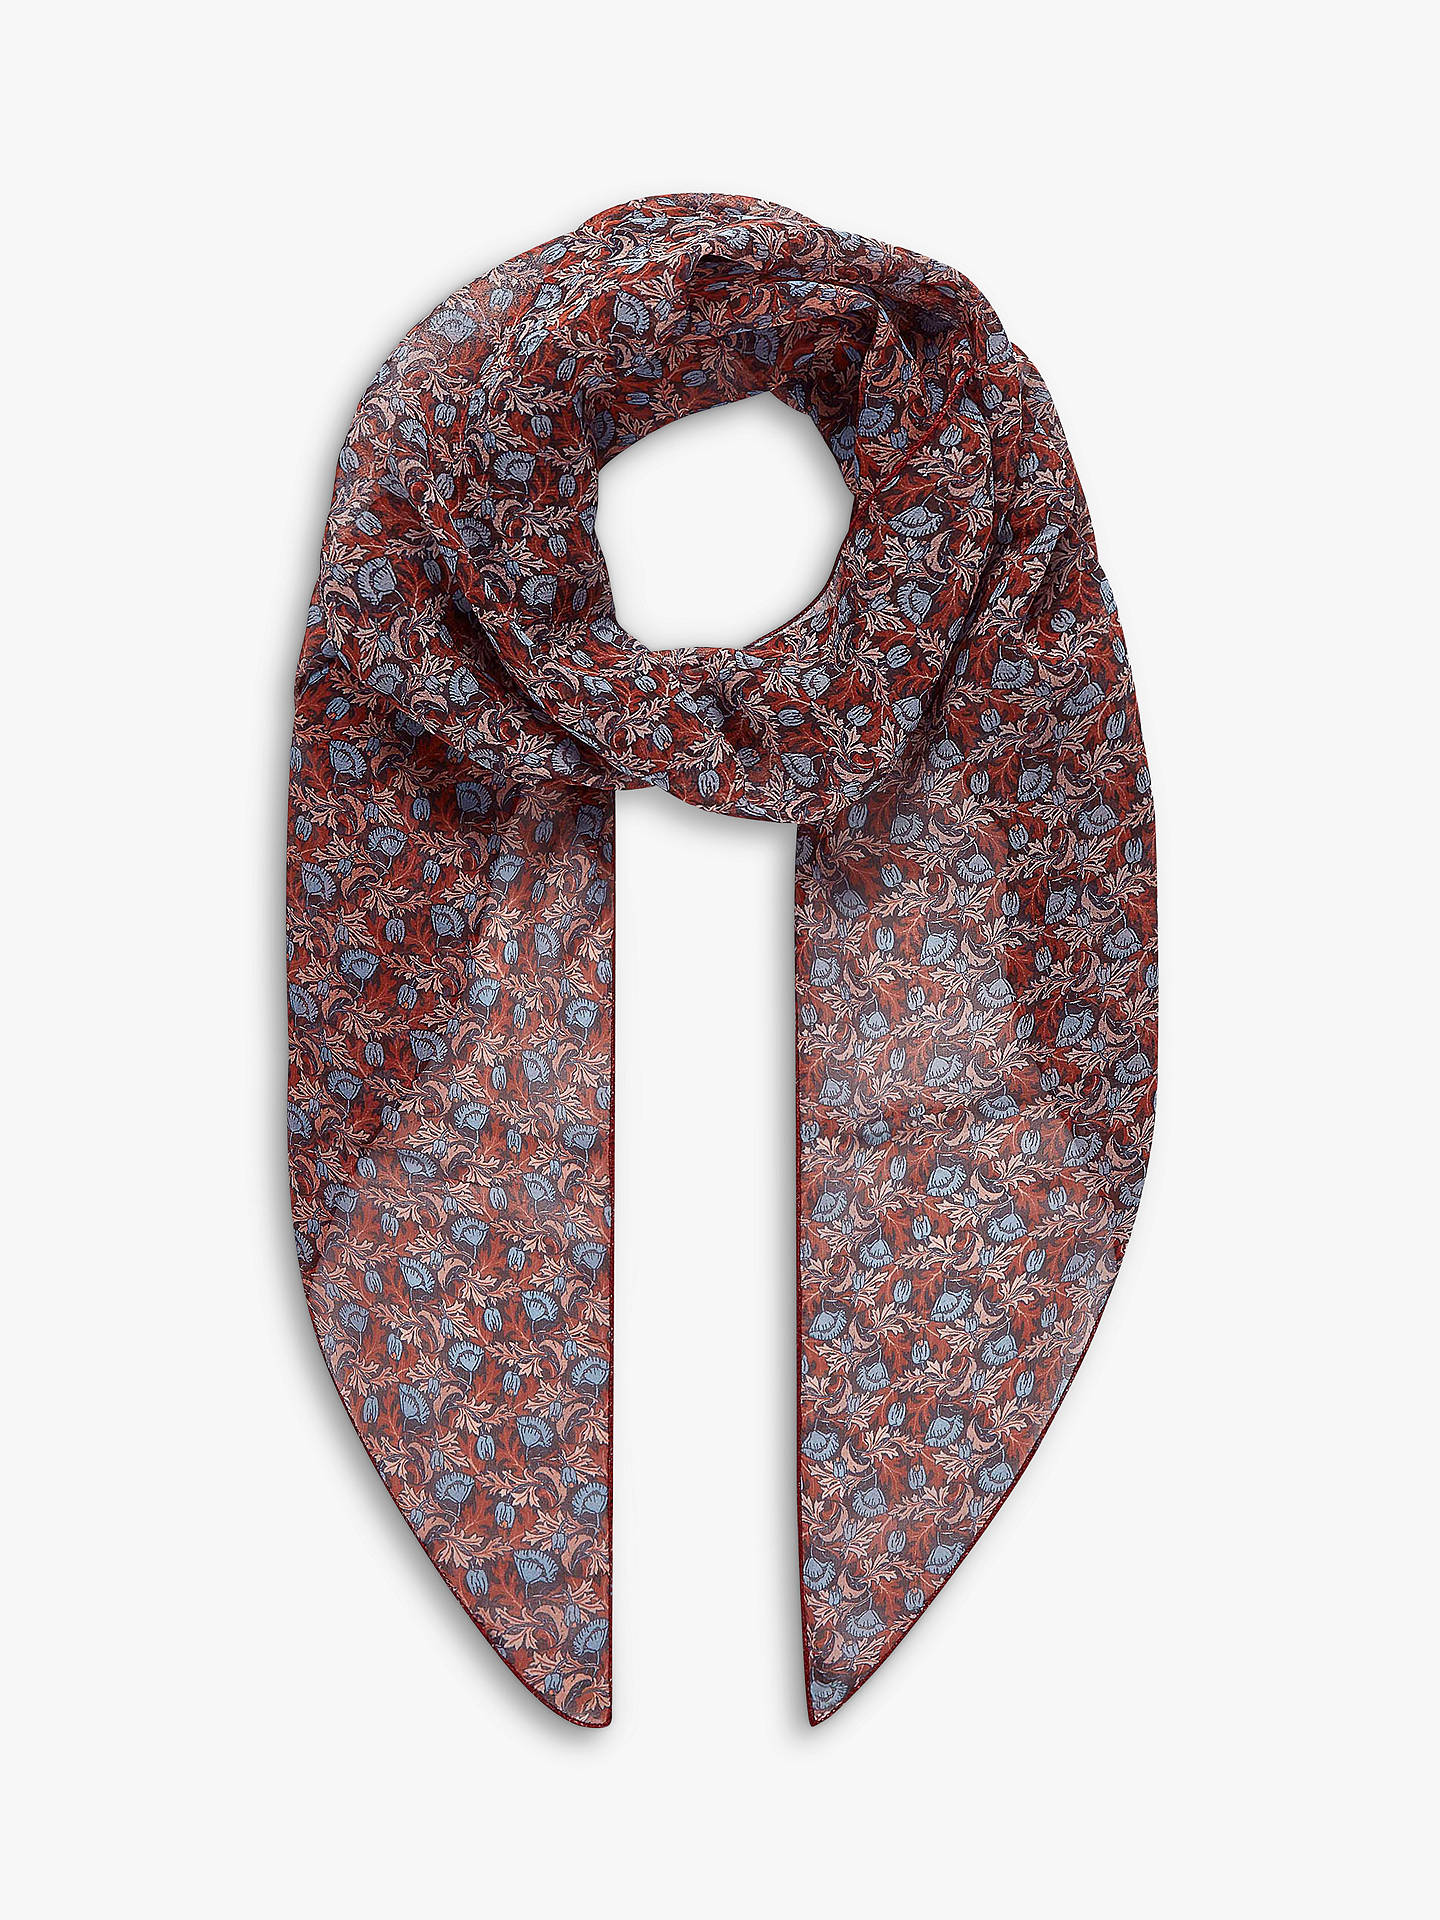 78f15d511 Buy Brora Liberty Print Silk Scarf, Mist Poppy Online at johnlewis.com ...